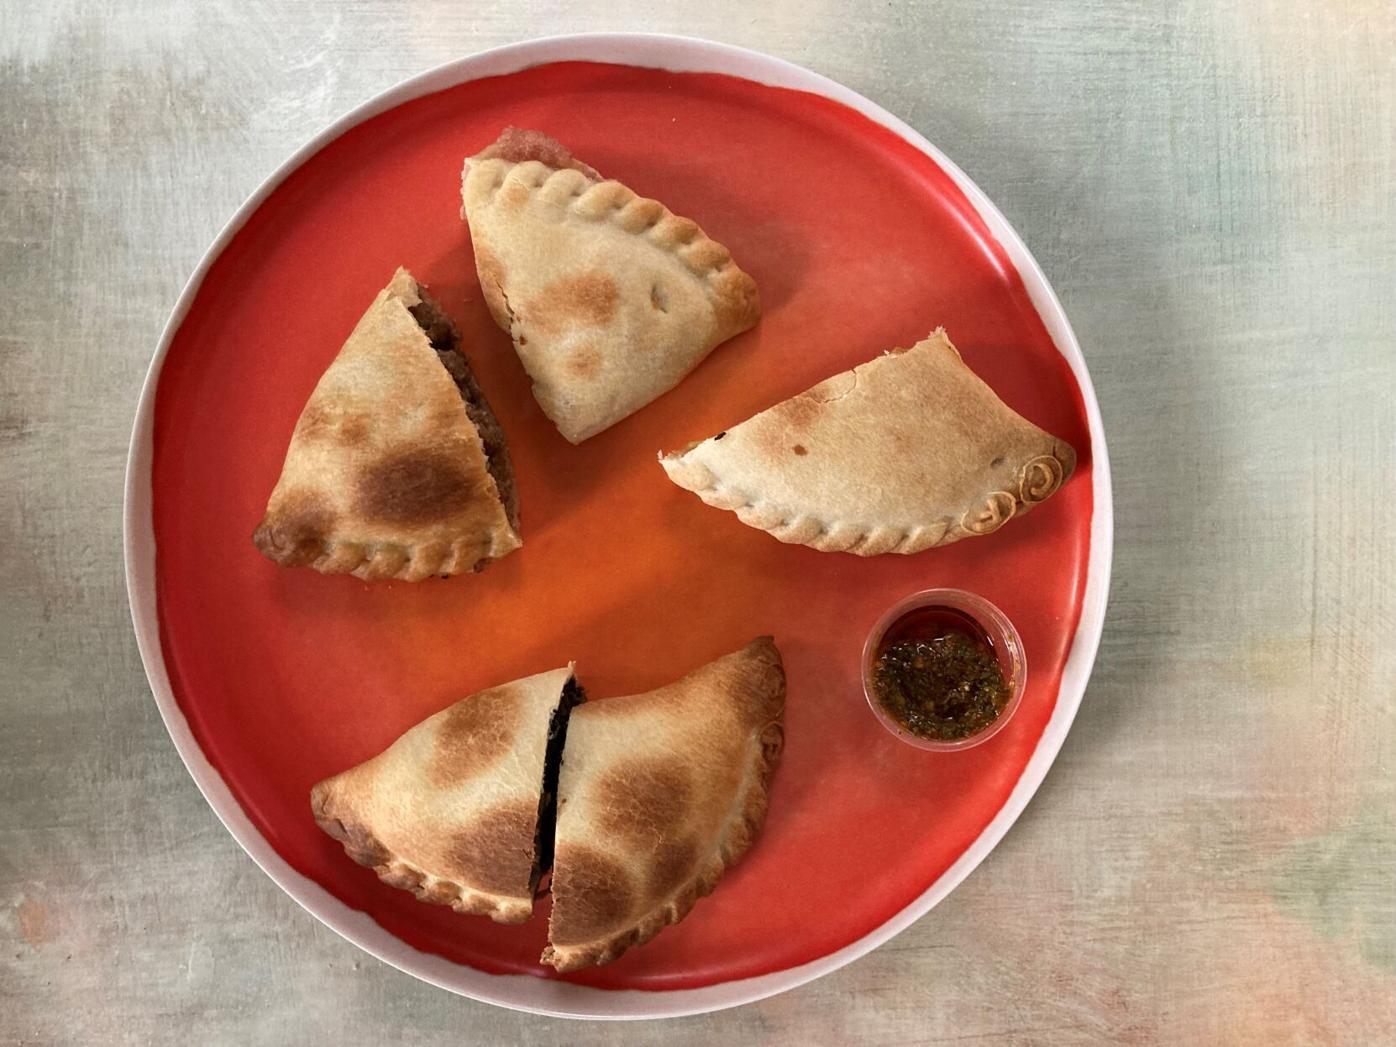 Empanadas, baked